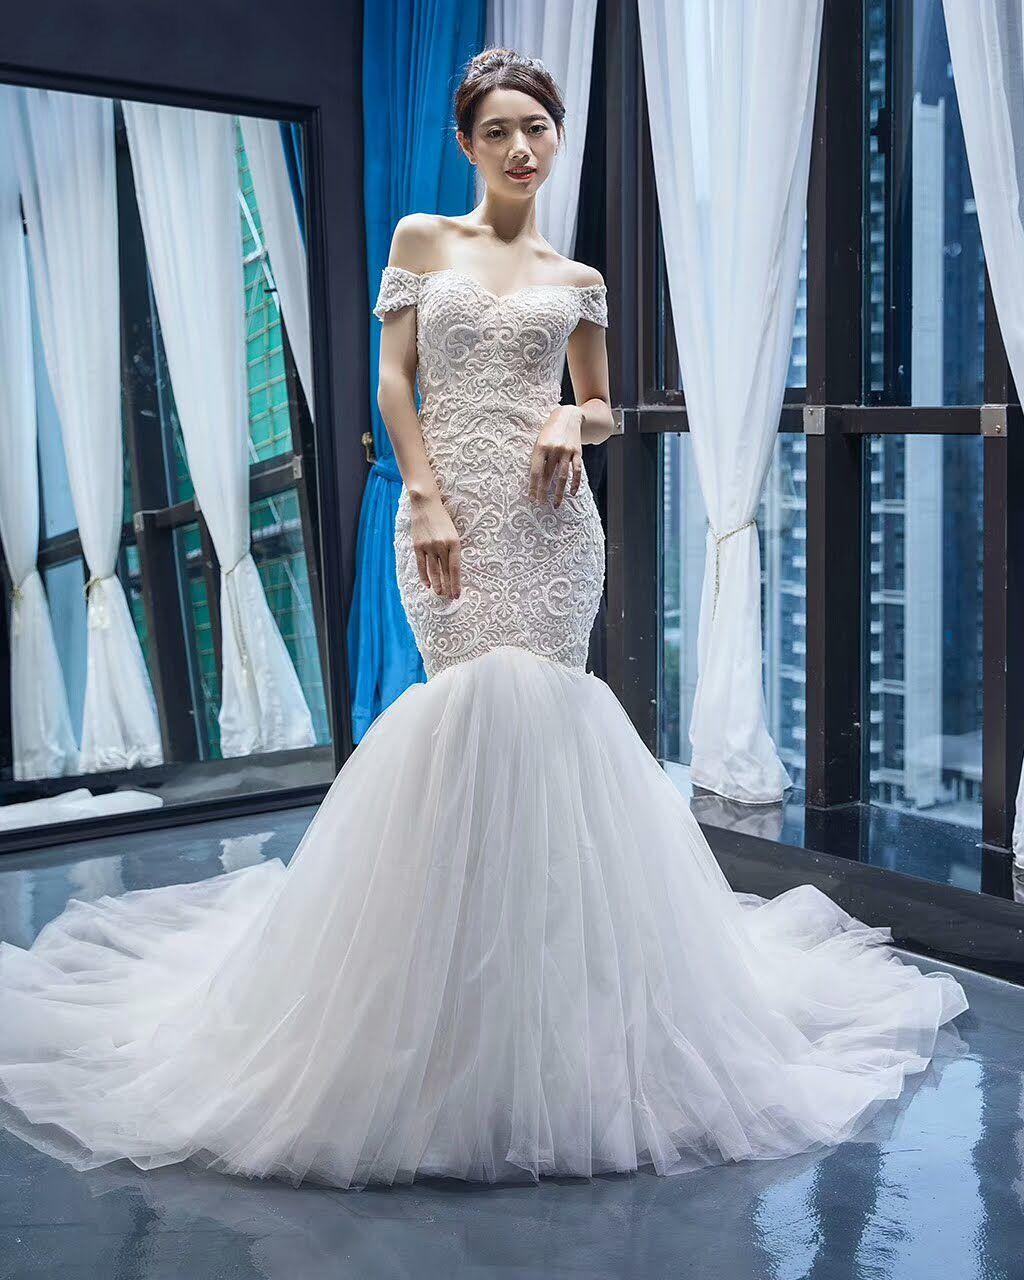 Xp Bridal Wedding Dress Wholeseller Instagram Xpbridal Id